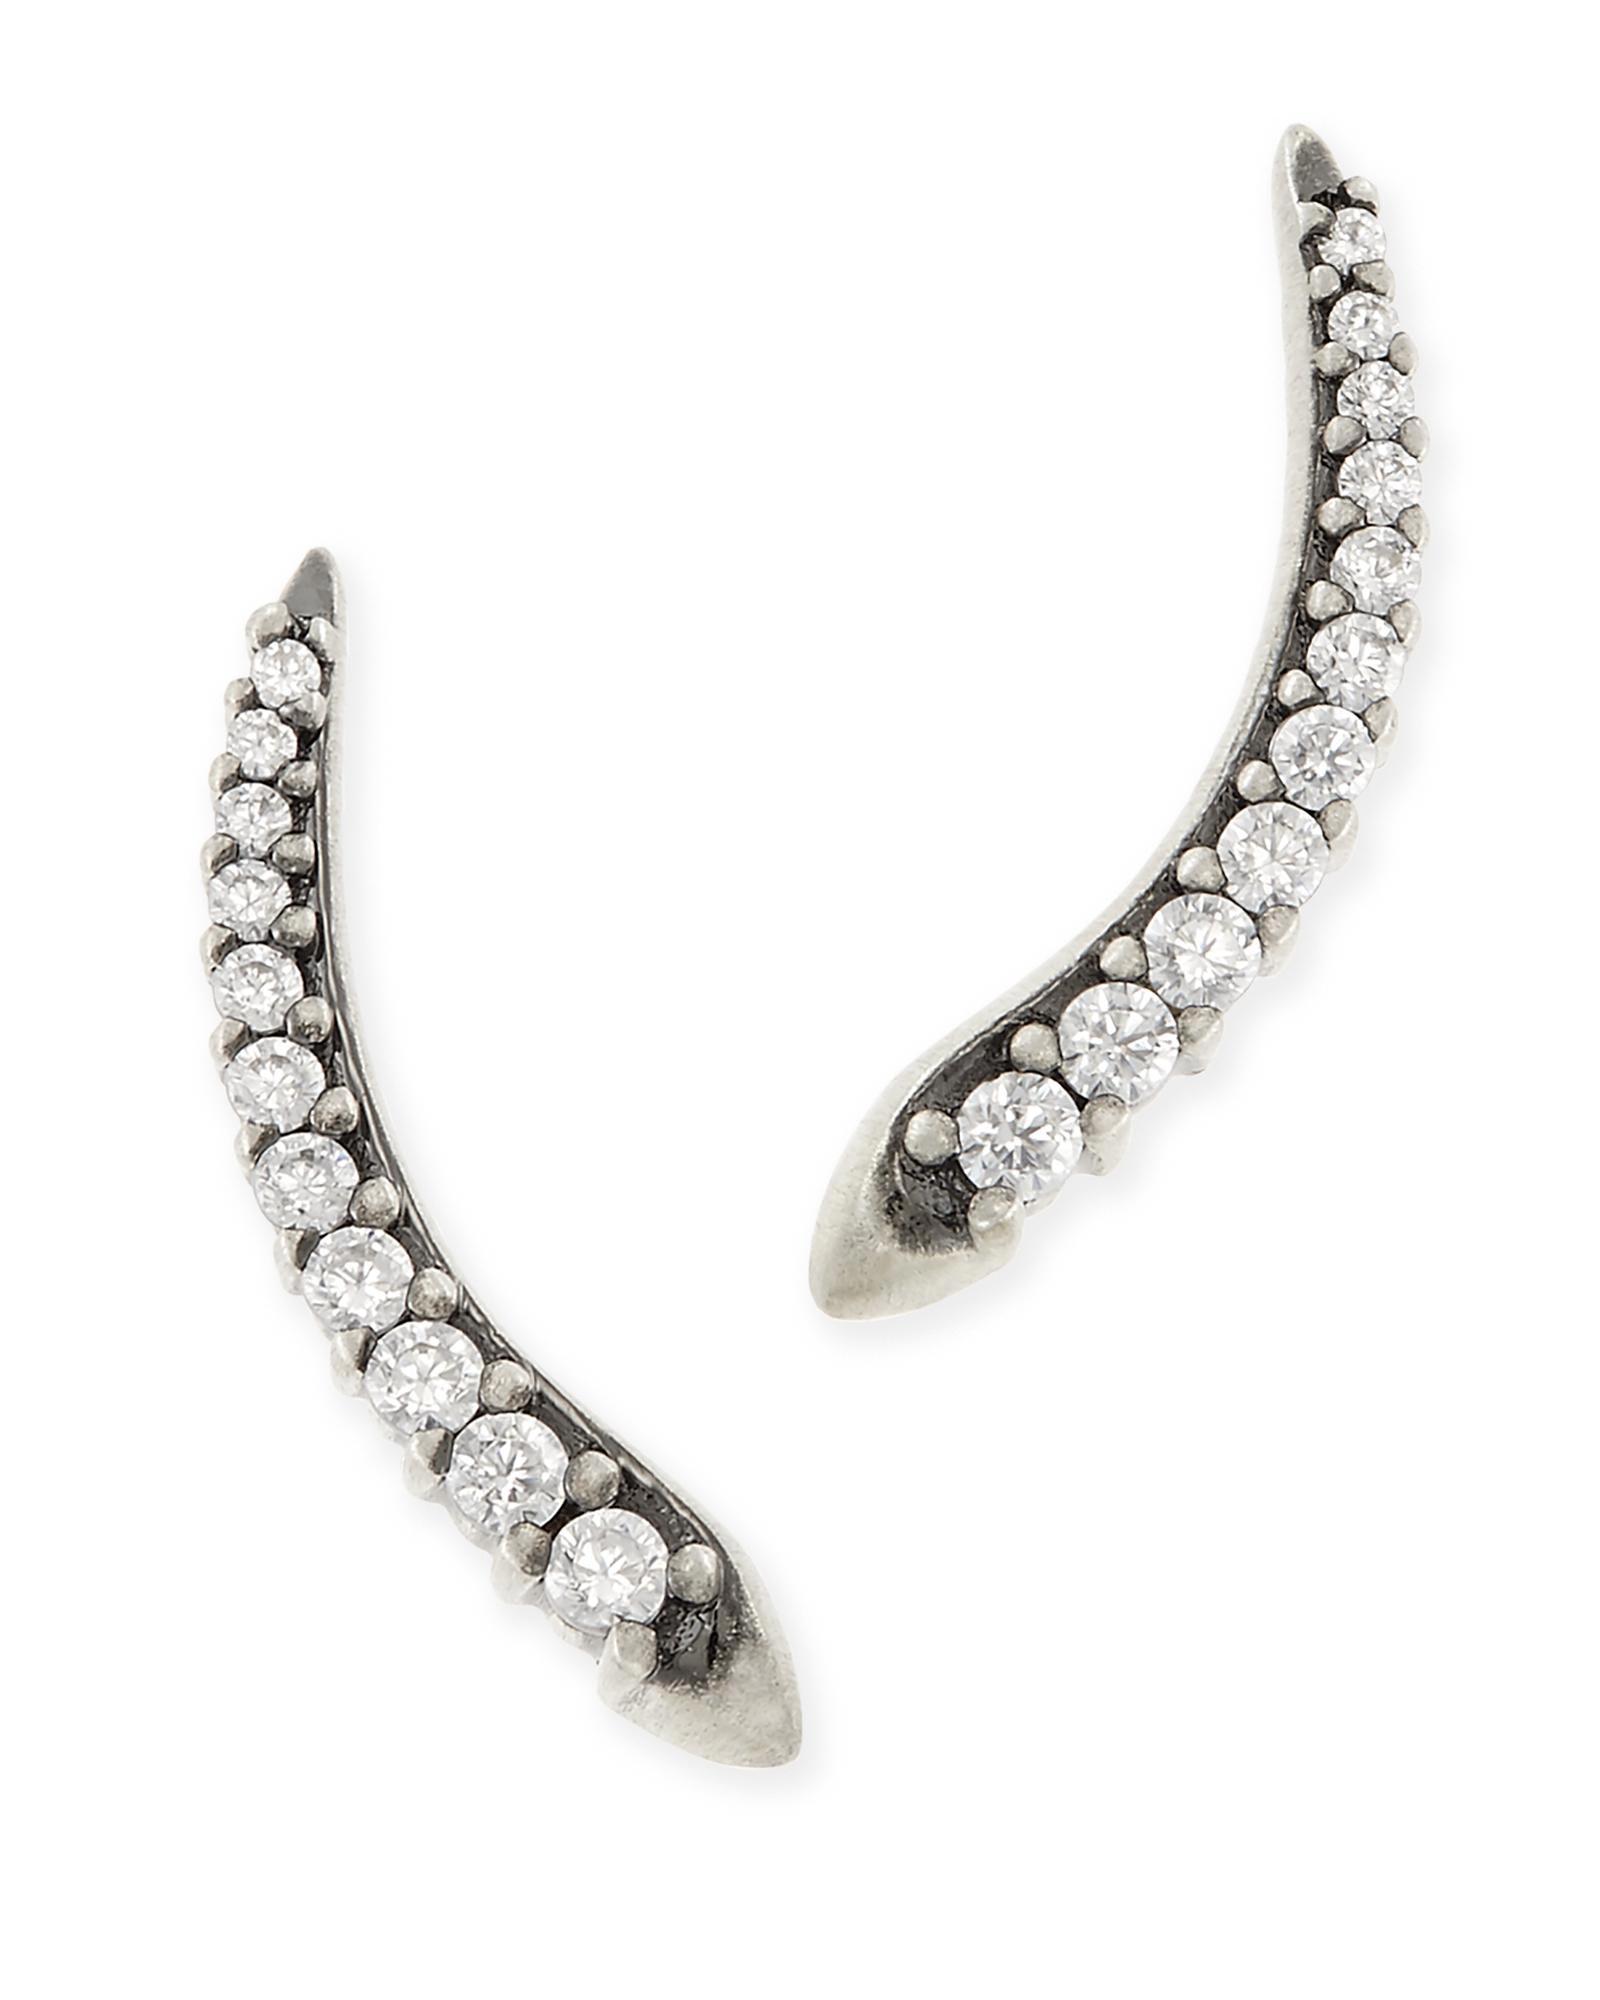 9726546305fa1 Whit Ear Climbers in Silver | Ear Climbers | Kendra Scott